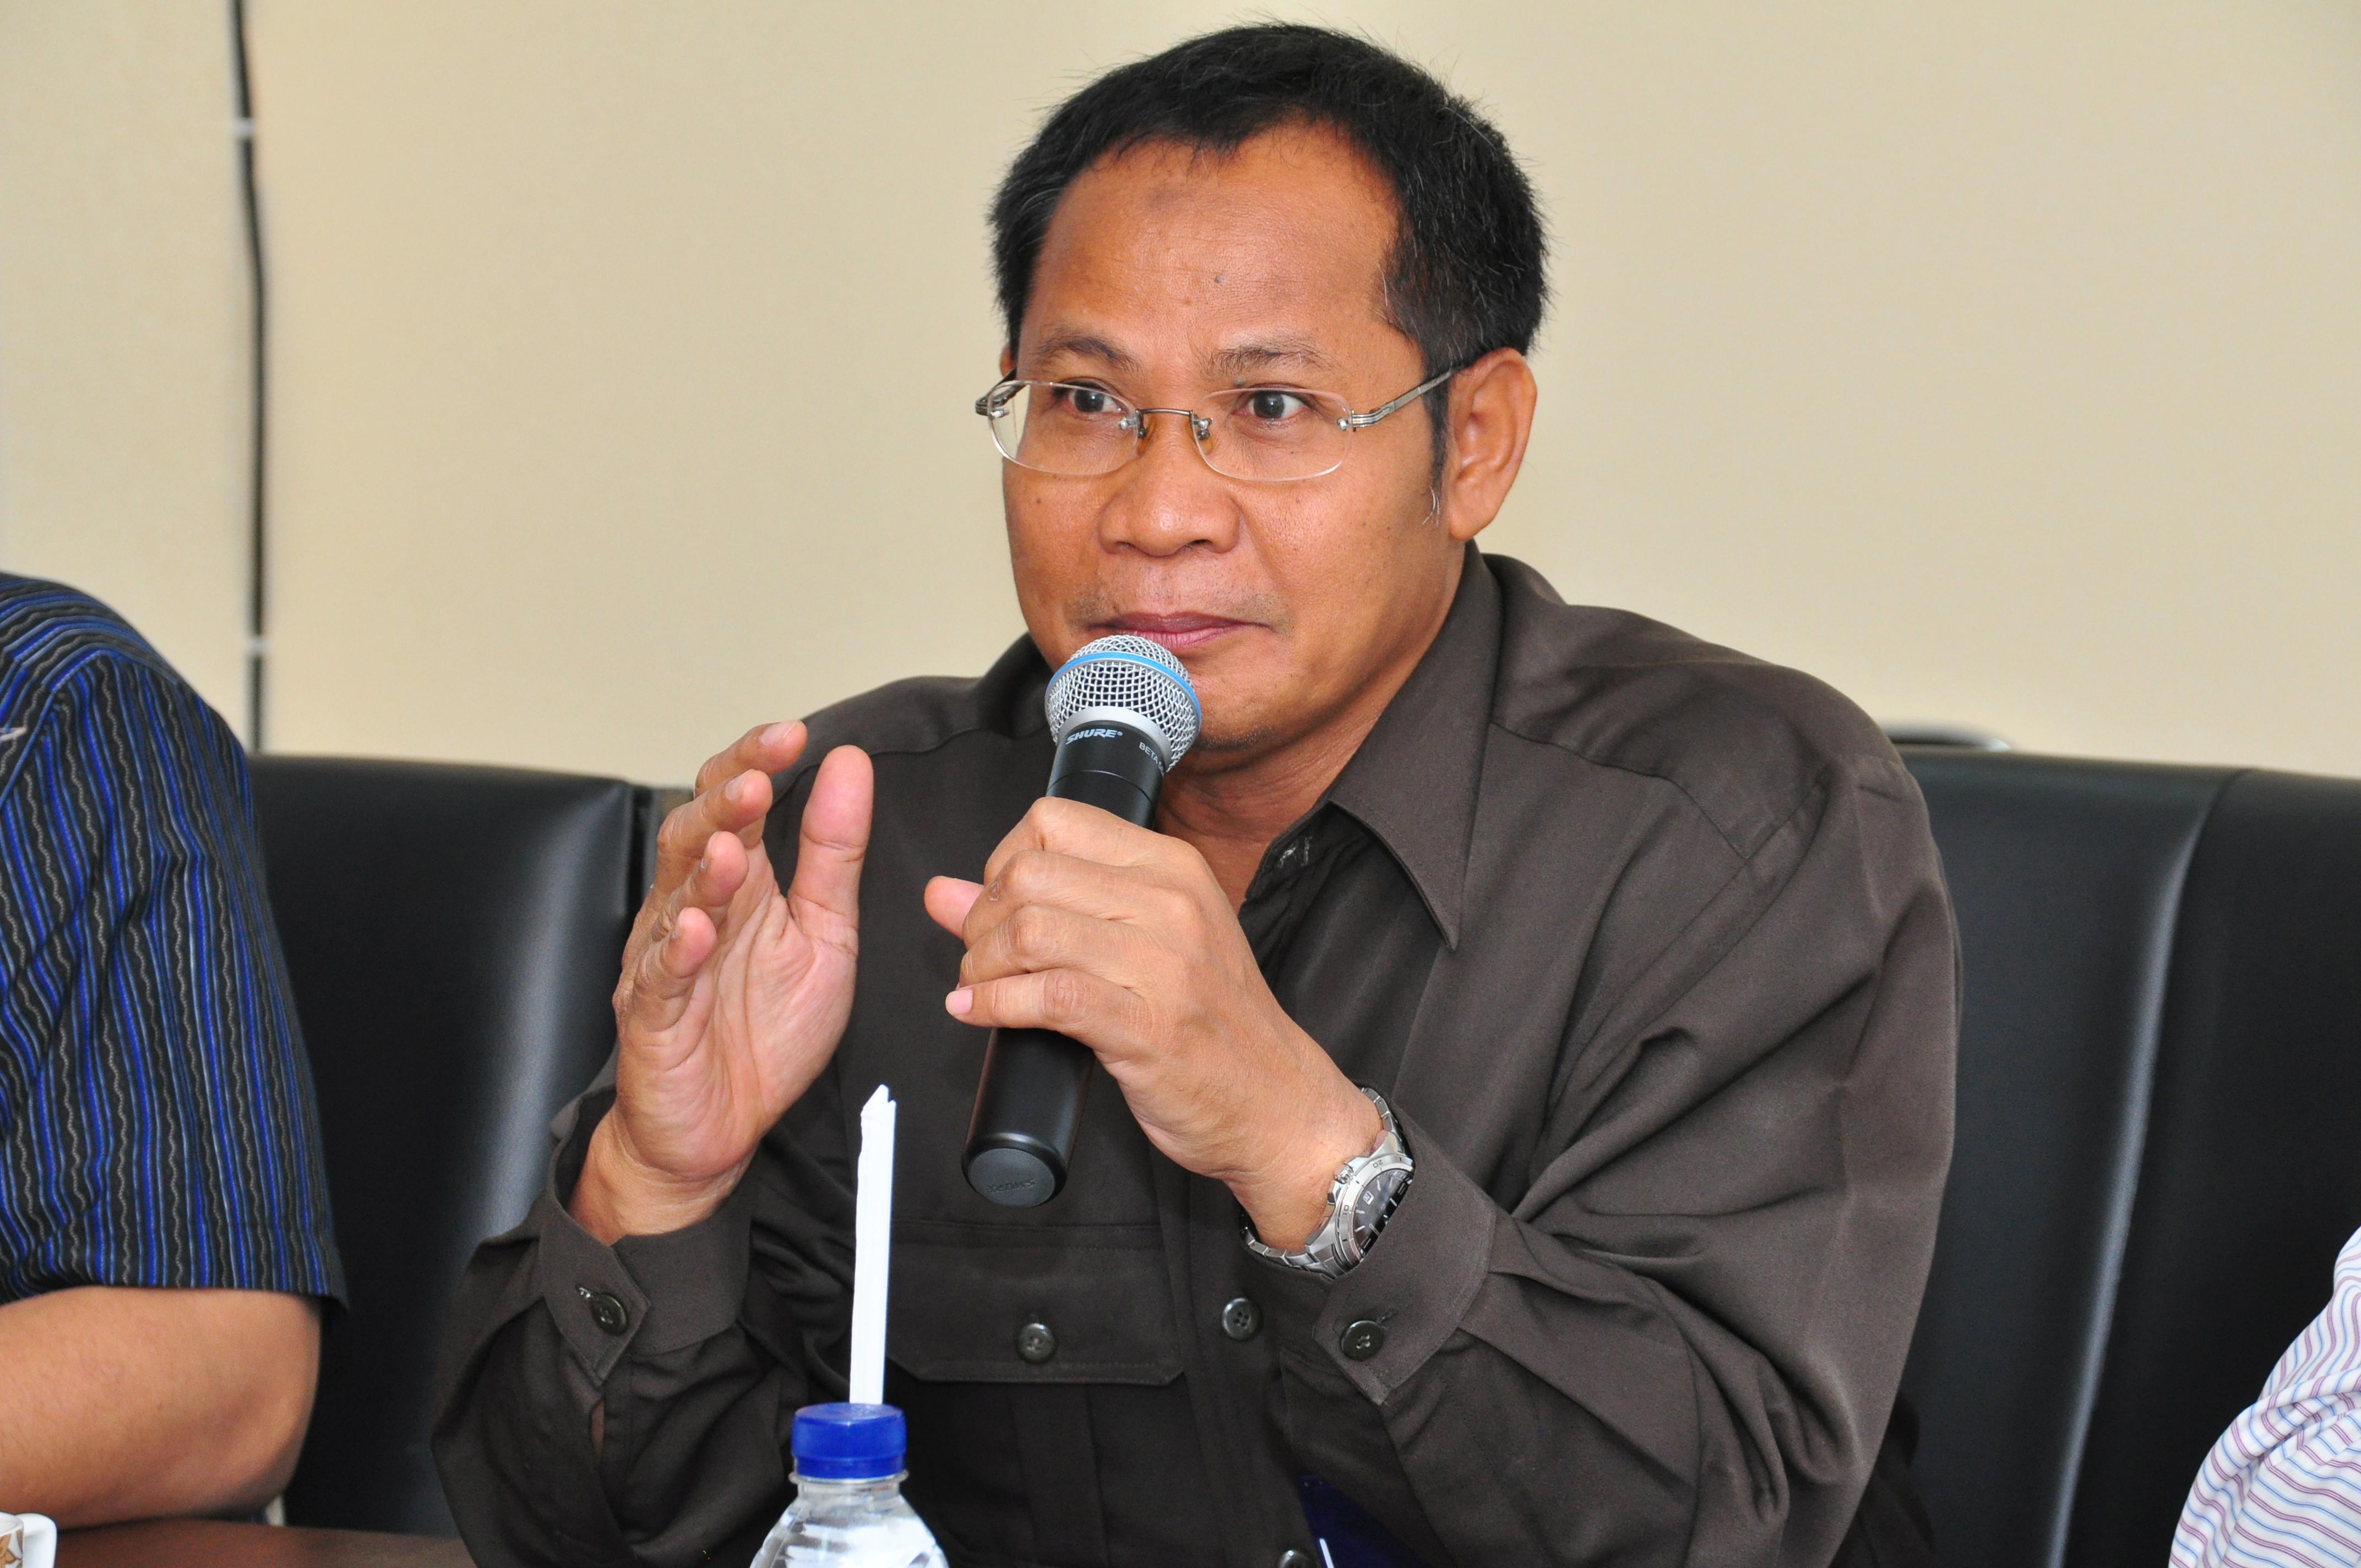 Kepala Sekretariat Perwakilan Bapak Drs. Sumarlan M.Si, memberikan jawaban atas pertanyaan Anggota Badan Anggaran DPRD Provinsi Maluku